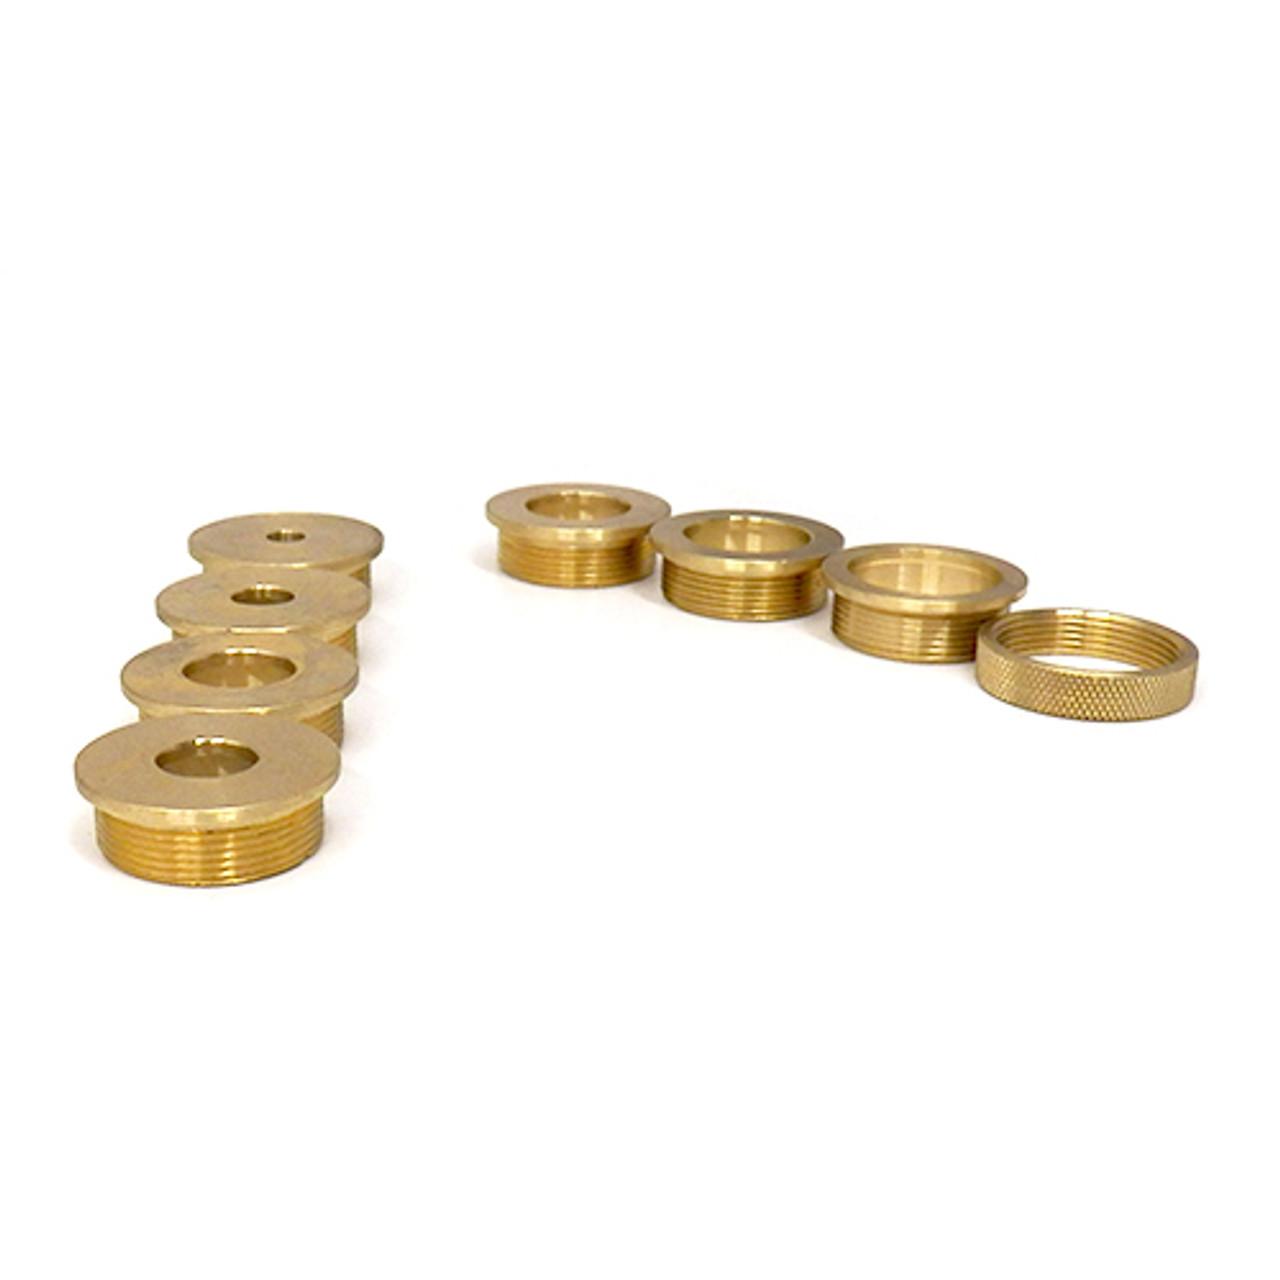 Klingspor Router Accessory, Brass Base Plate Reducers, 8 Piece Set